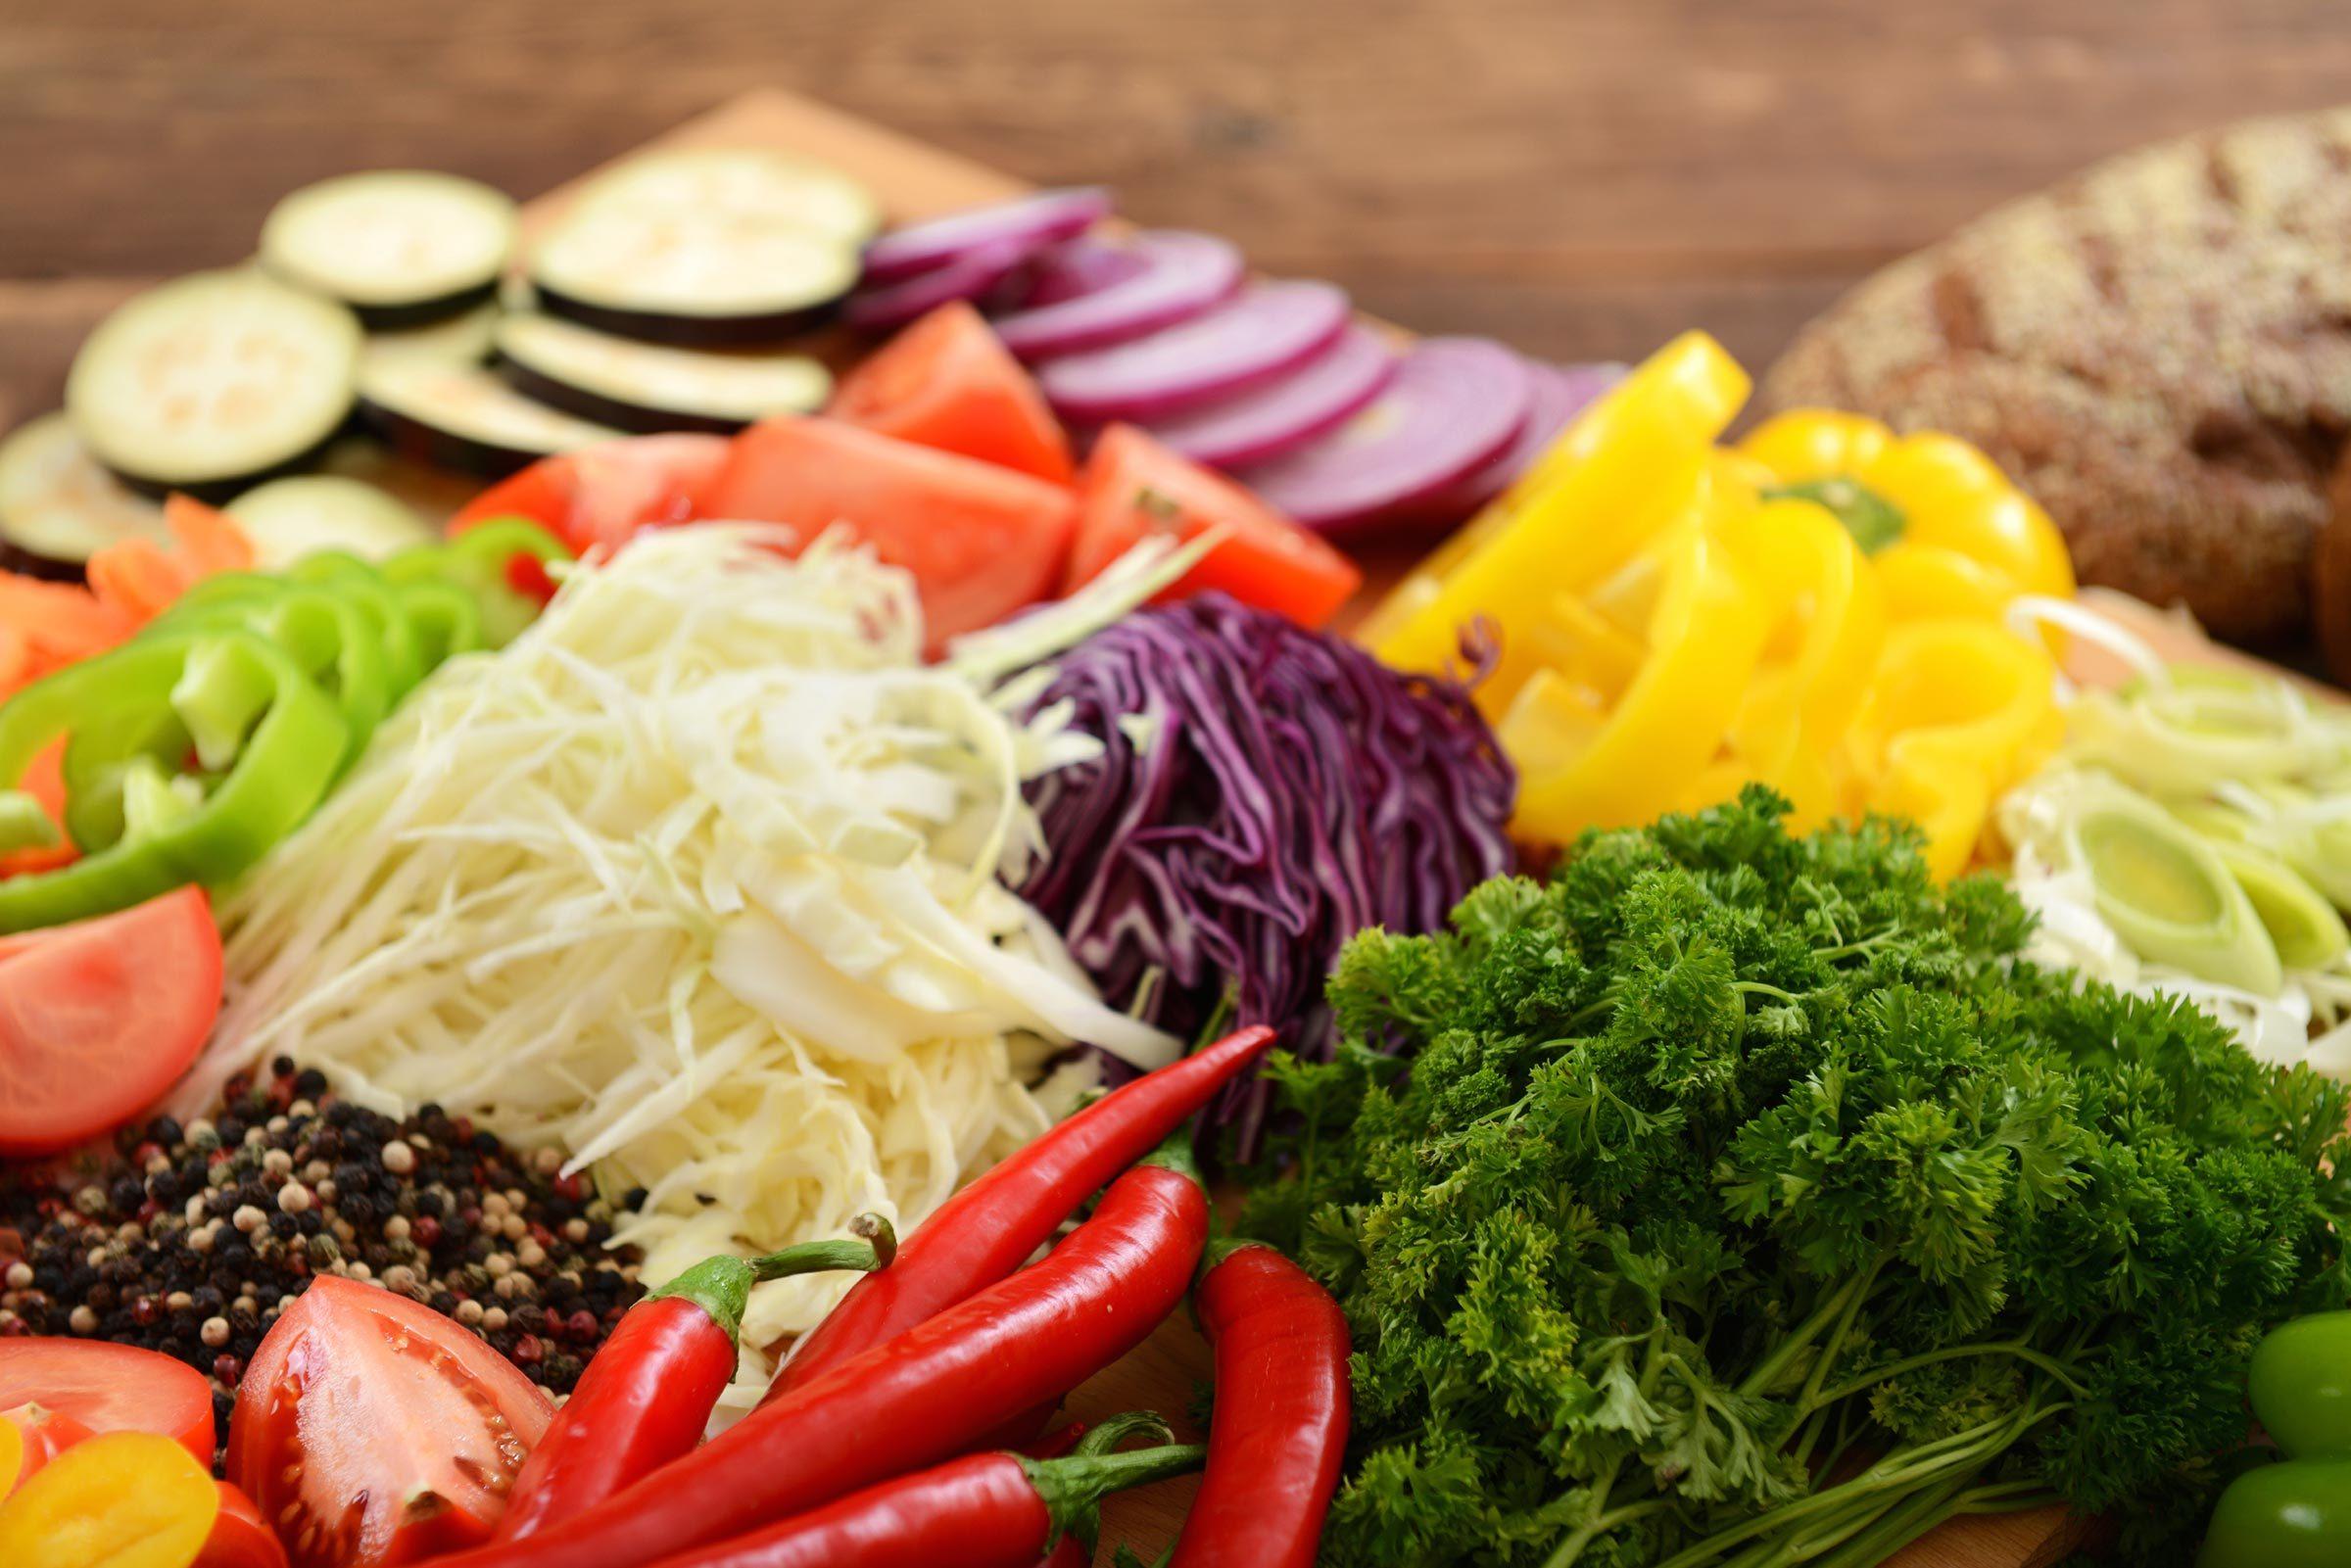 10. Precut produce: 40% markup